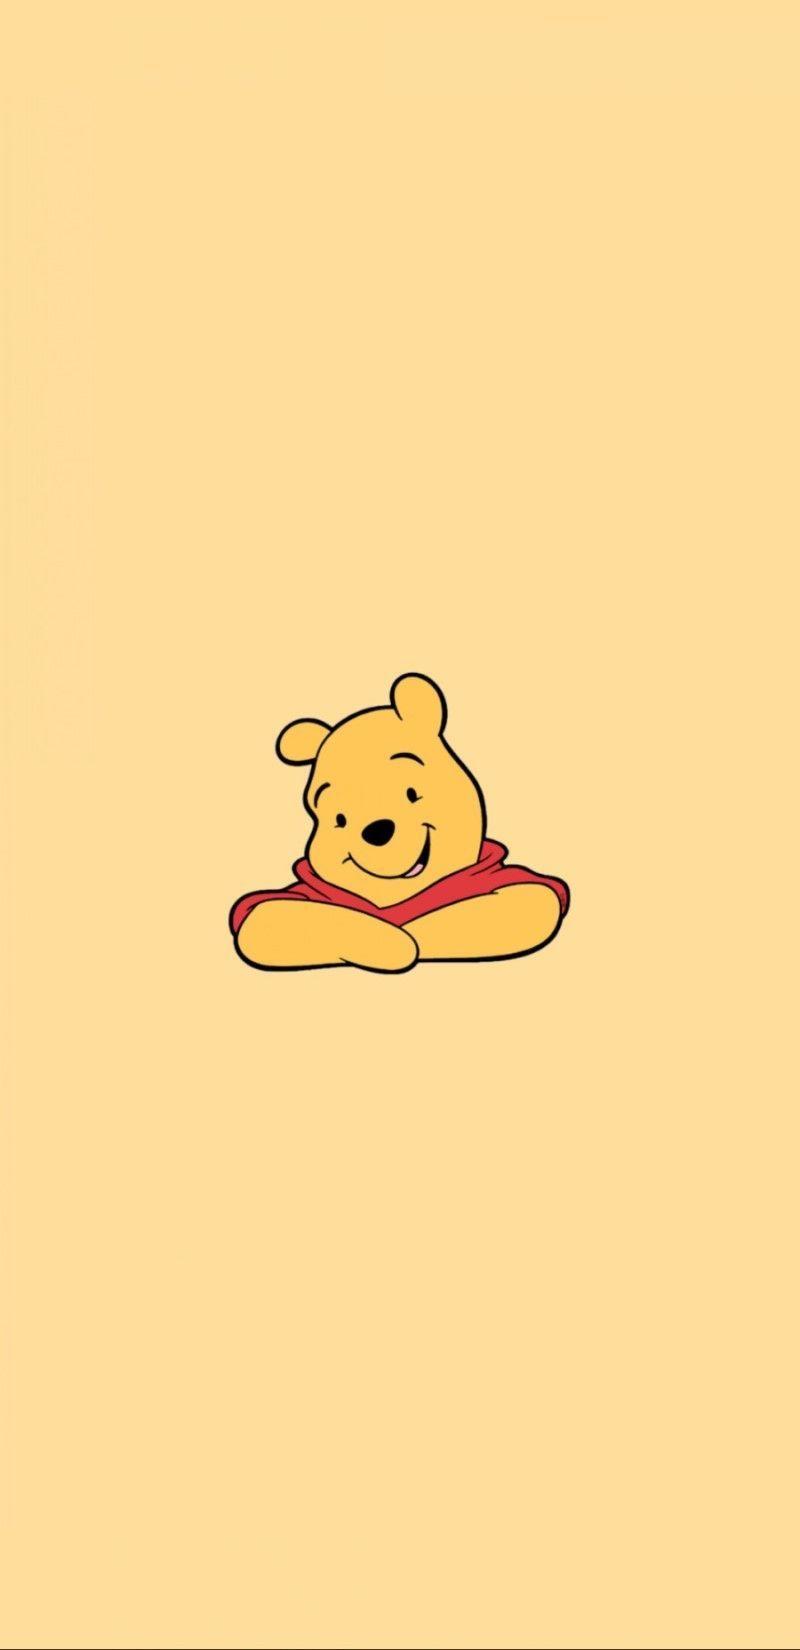 Winnie the Pooh : 네이